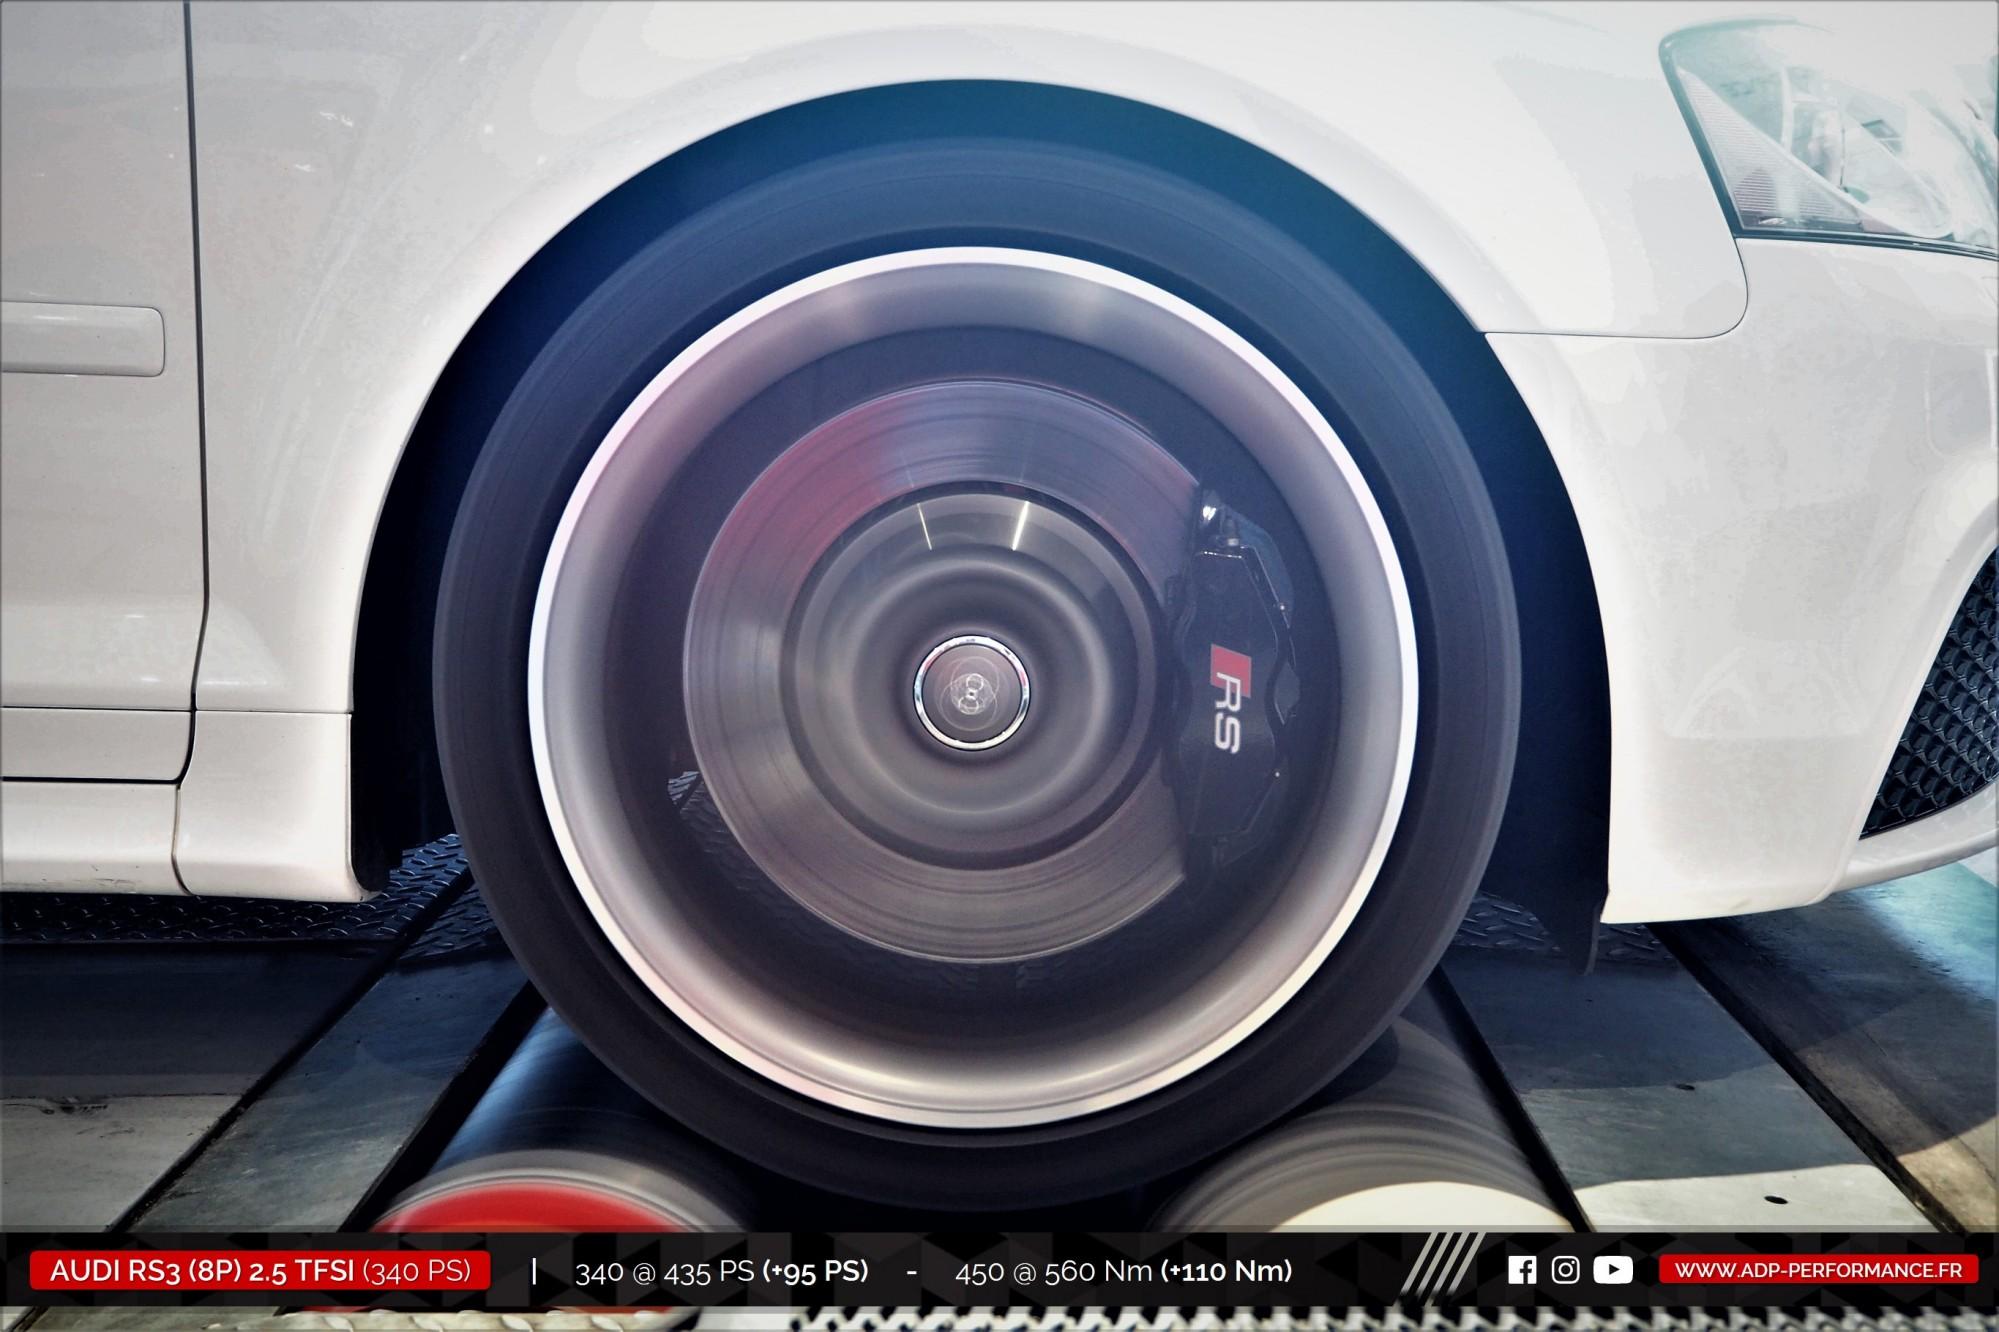 Reprogrammation moteur Nimes - Audi RS3 8P 2.5 TFSI 340cv - ADP Performance